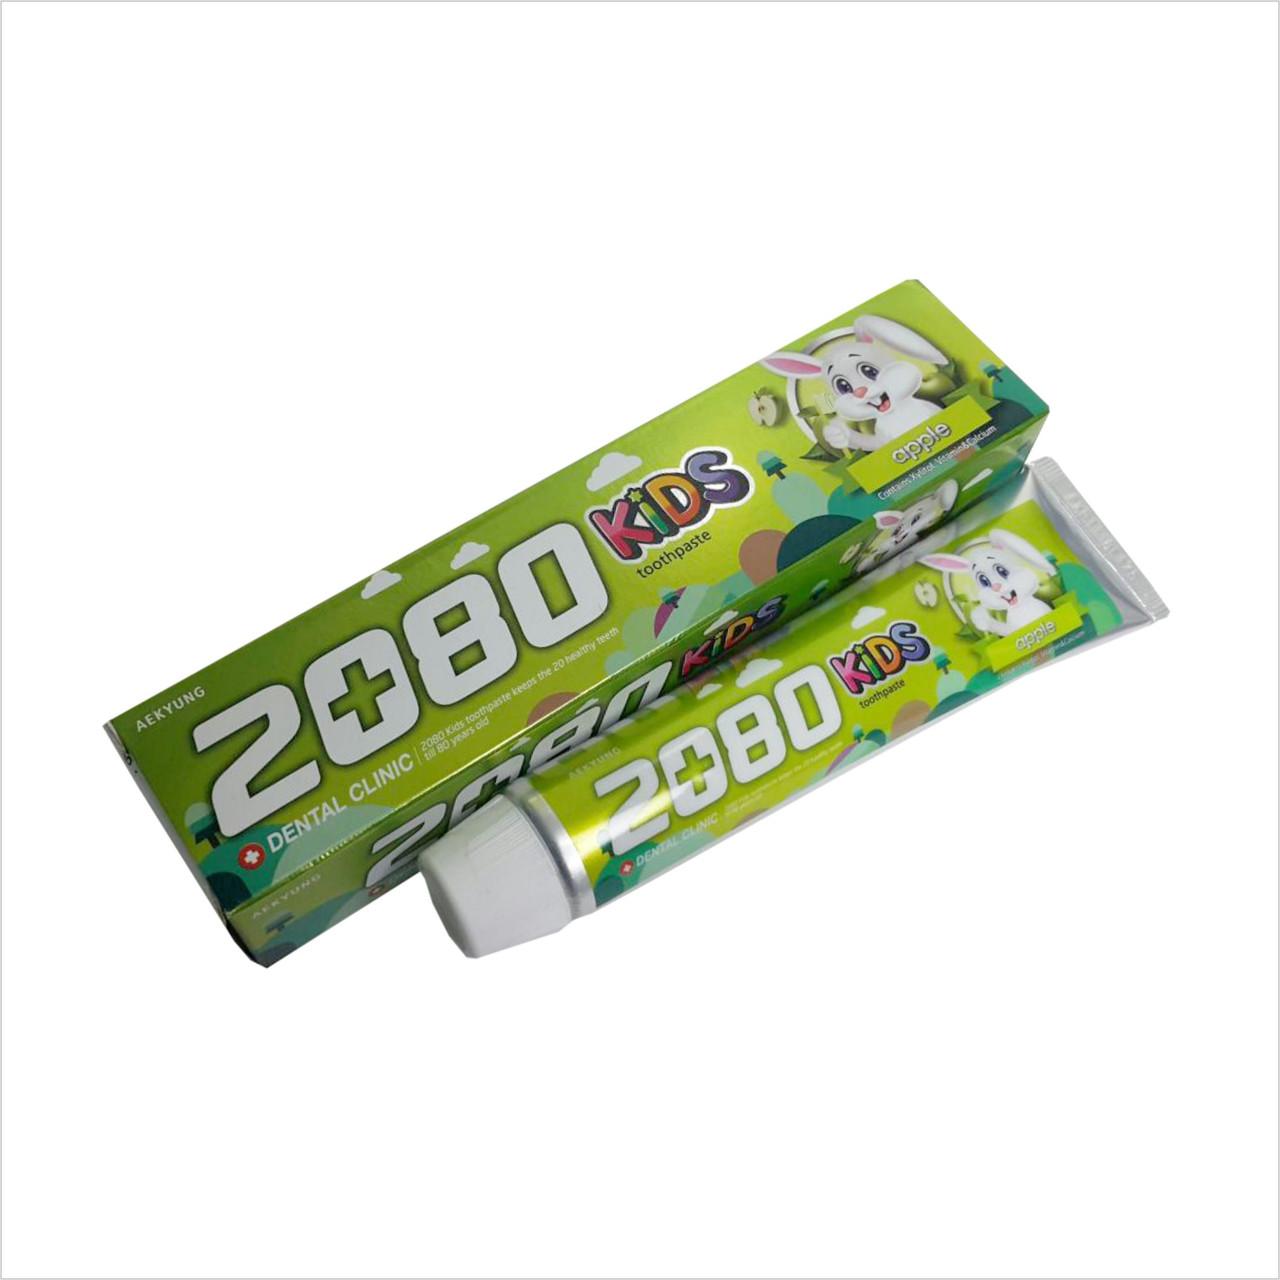 "Dental Clinic 2080 Toothpaste for Children Apple Детская зубная паста ""Яблоко"" 80 гр"